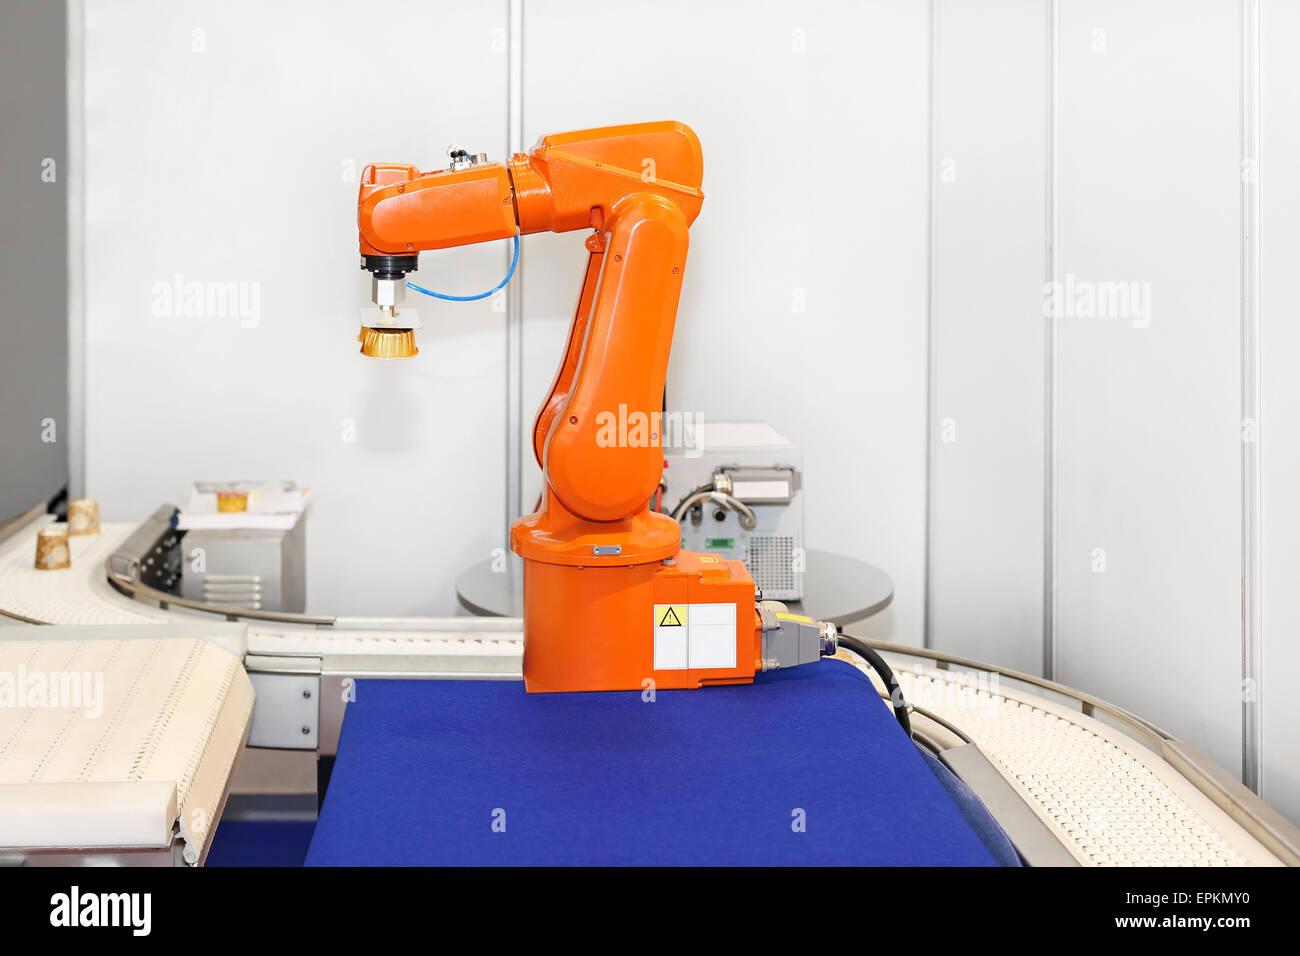 Robotic arm - Stock Image